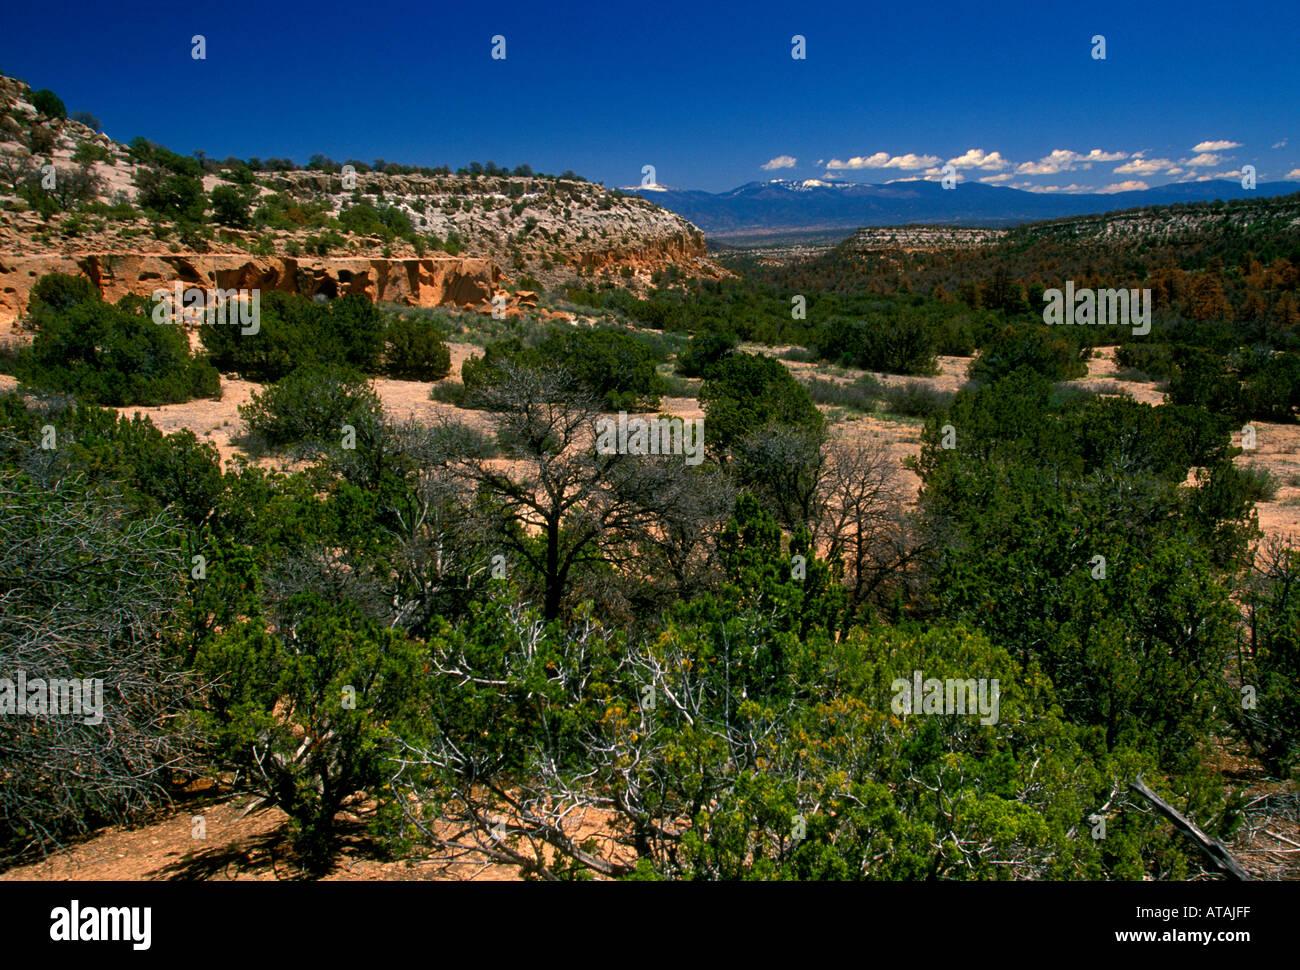 Tsankawi Prehistoric Sites, Bandelier National Monument, Sandoval County, New Mexico, United States, North America Stock Photo